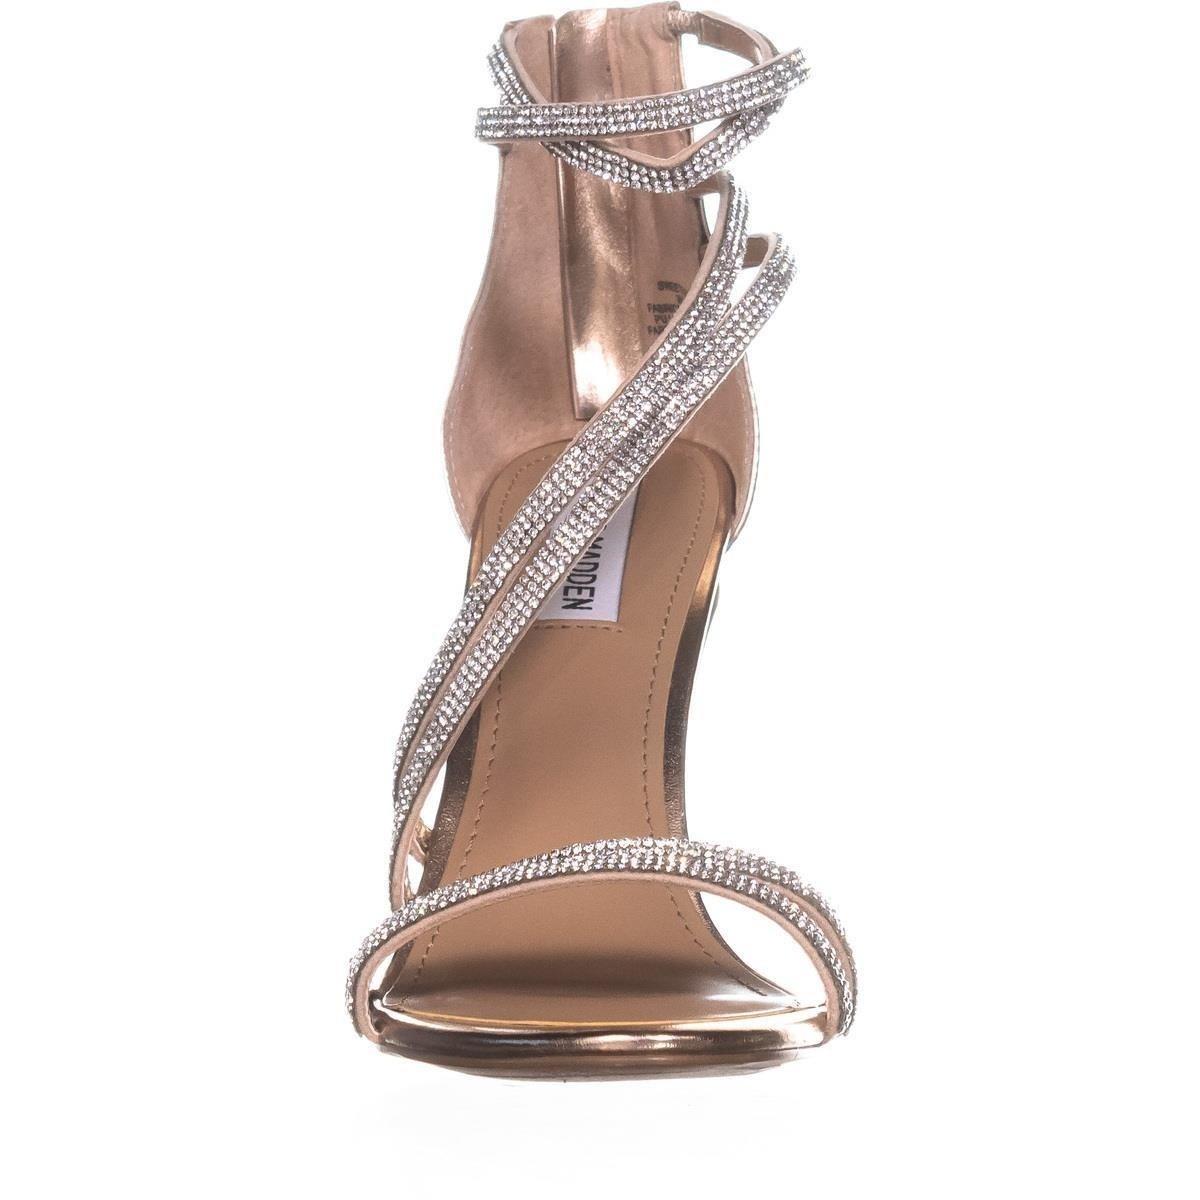 045b0059a82 zapatos zapatillas tacones steve madden sweetest rose gold · zapatos  zapatillas tacones. Cargando zoom.